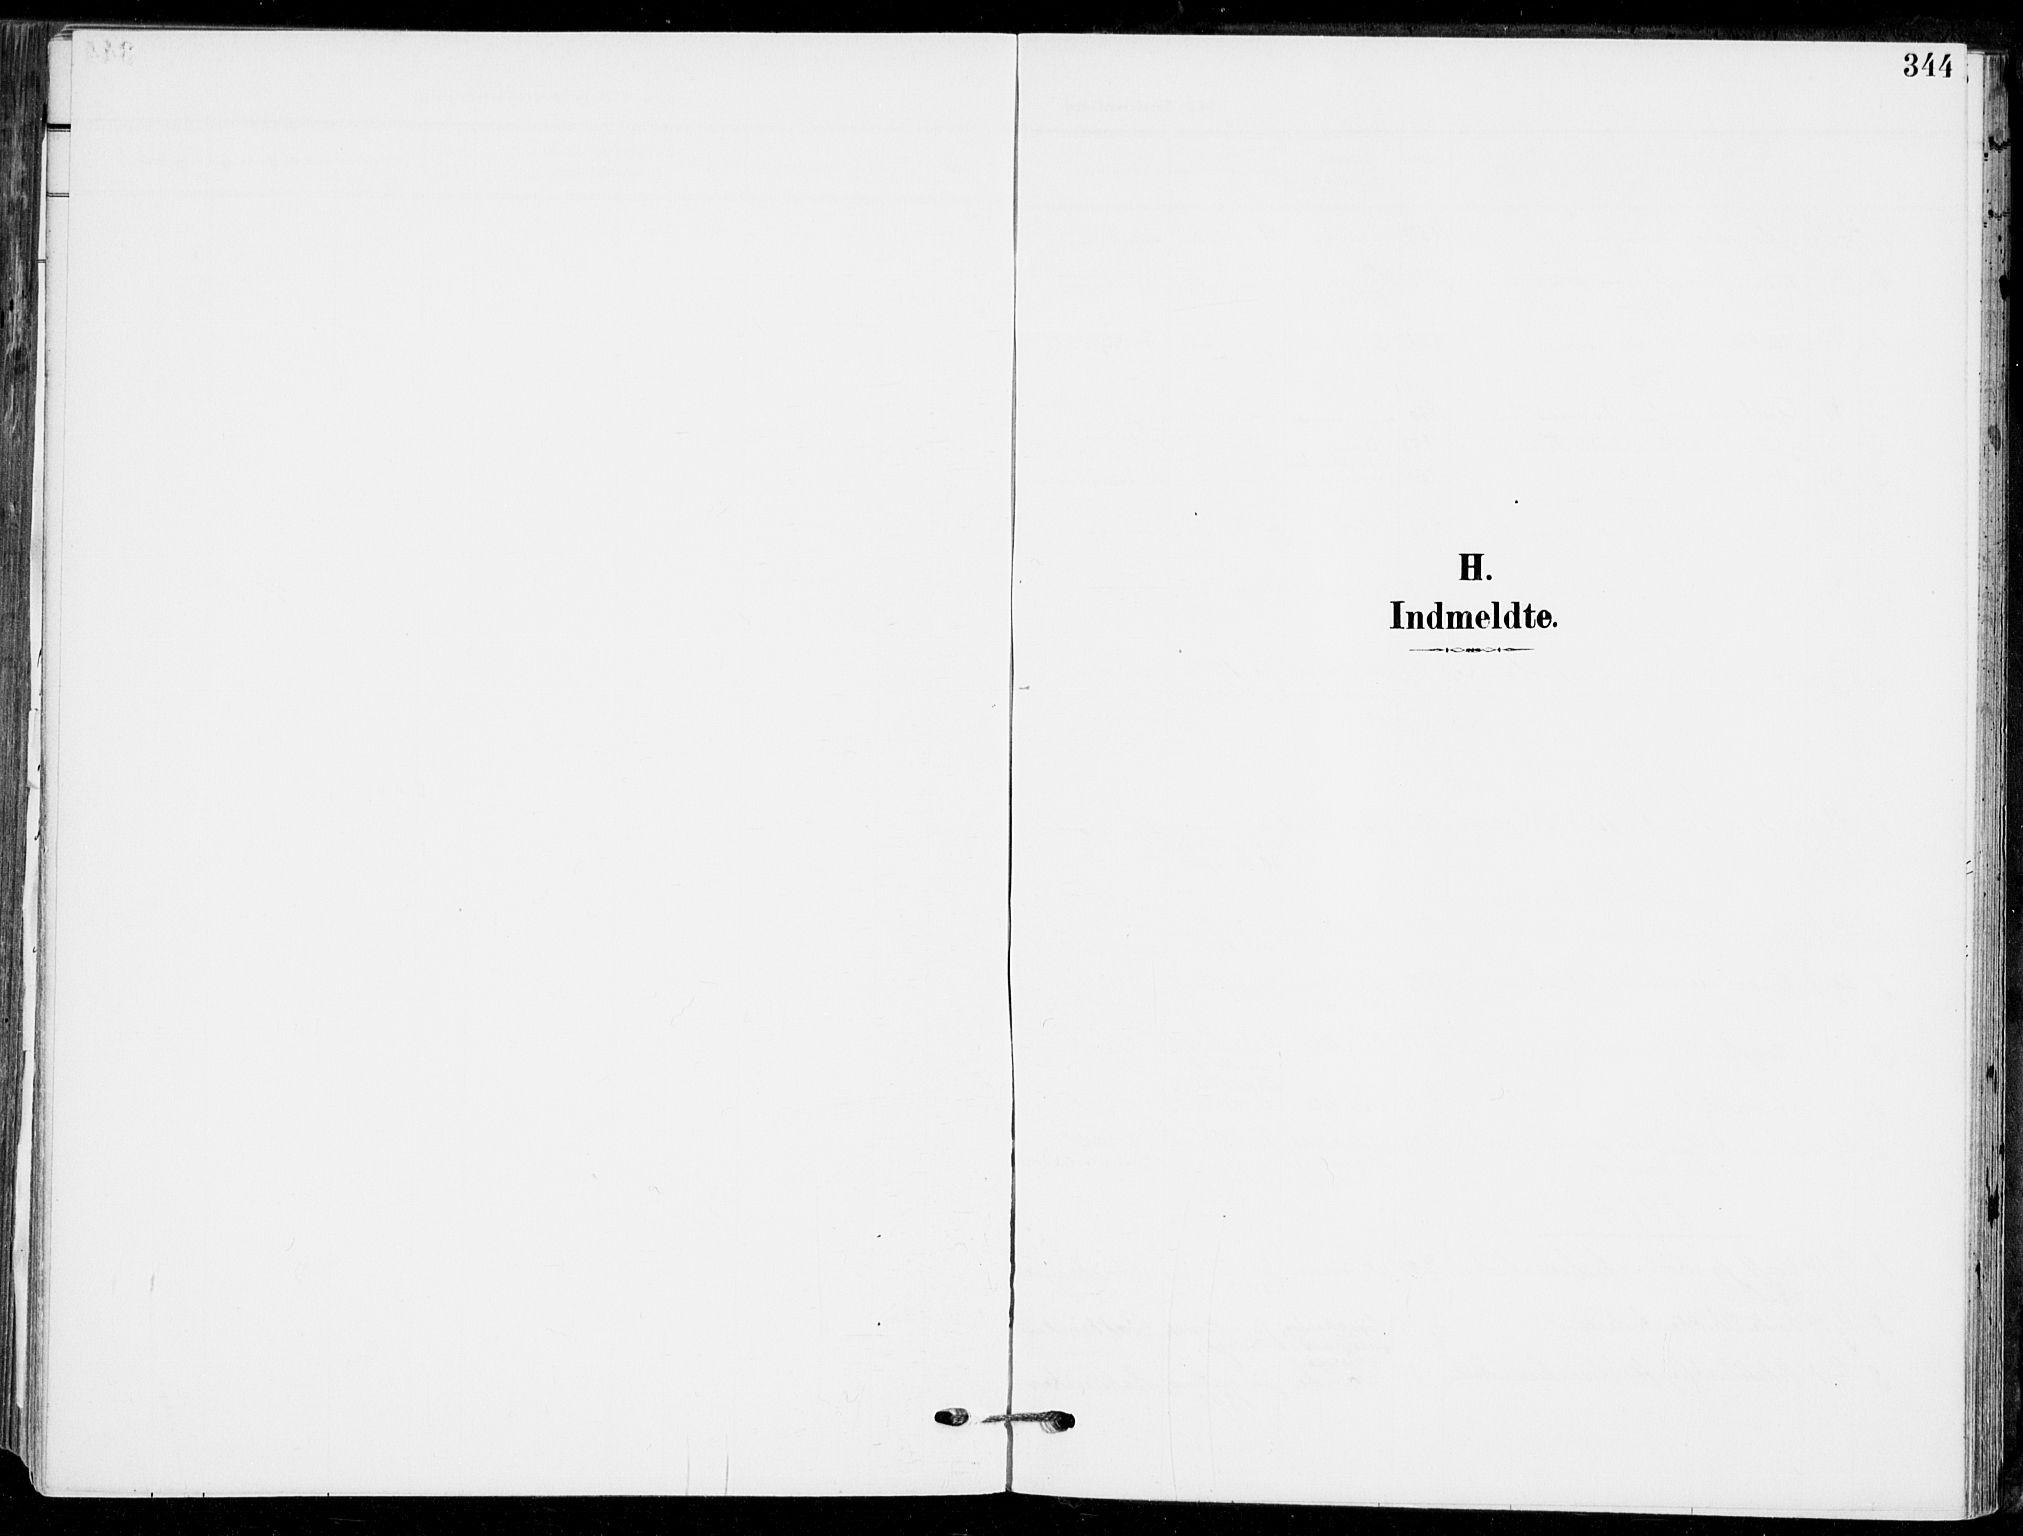 SAKO, Sande Kirkebøker, F/Fa/L0008: Parish register (official) no. 8, 1904-1921, p. 344